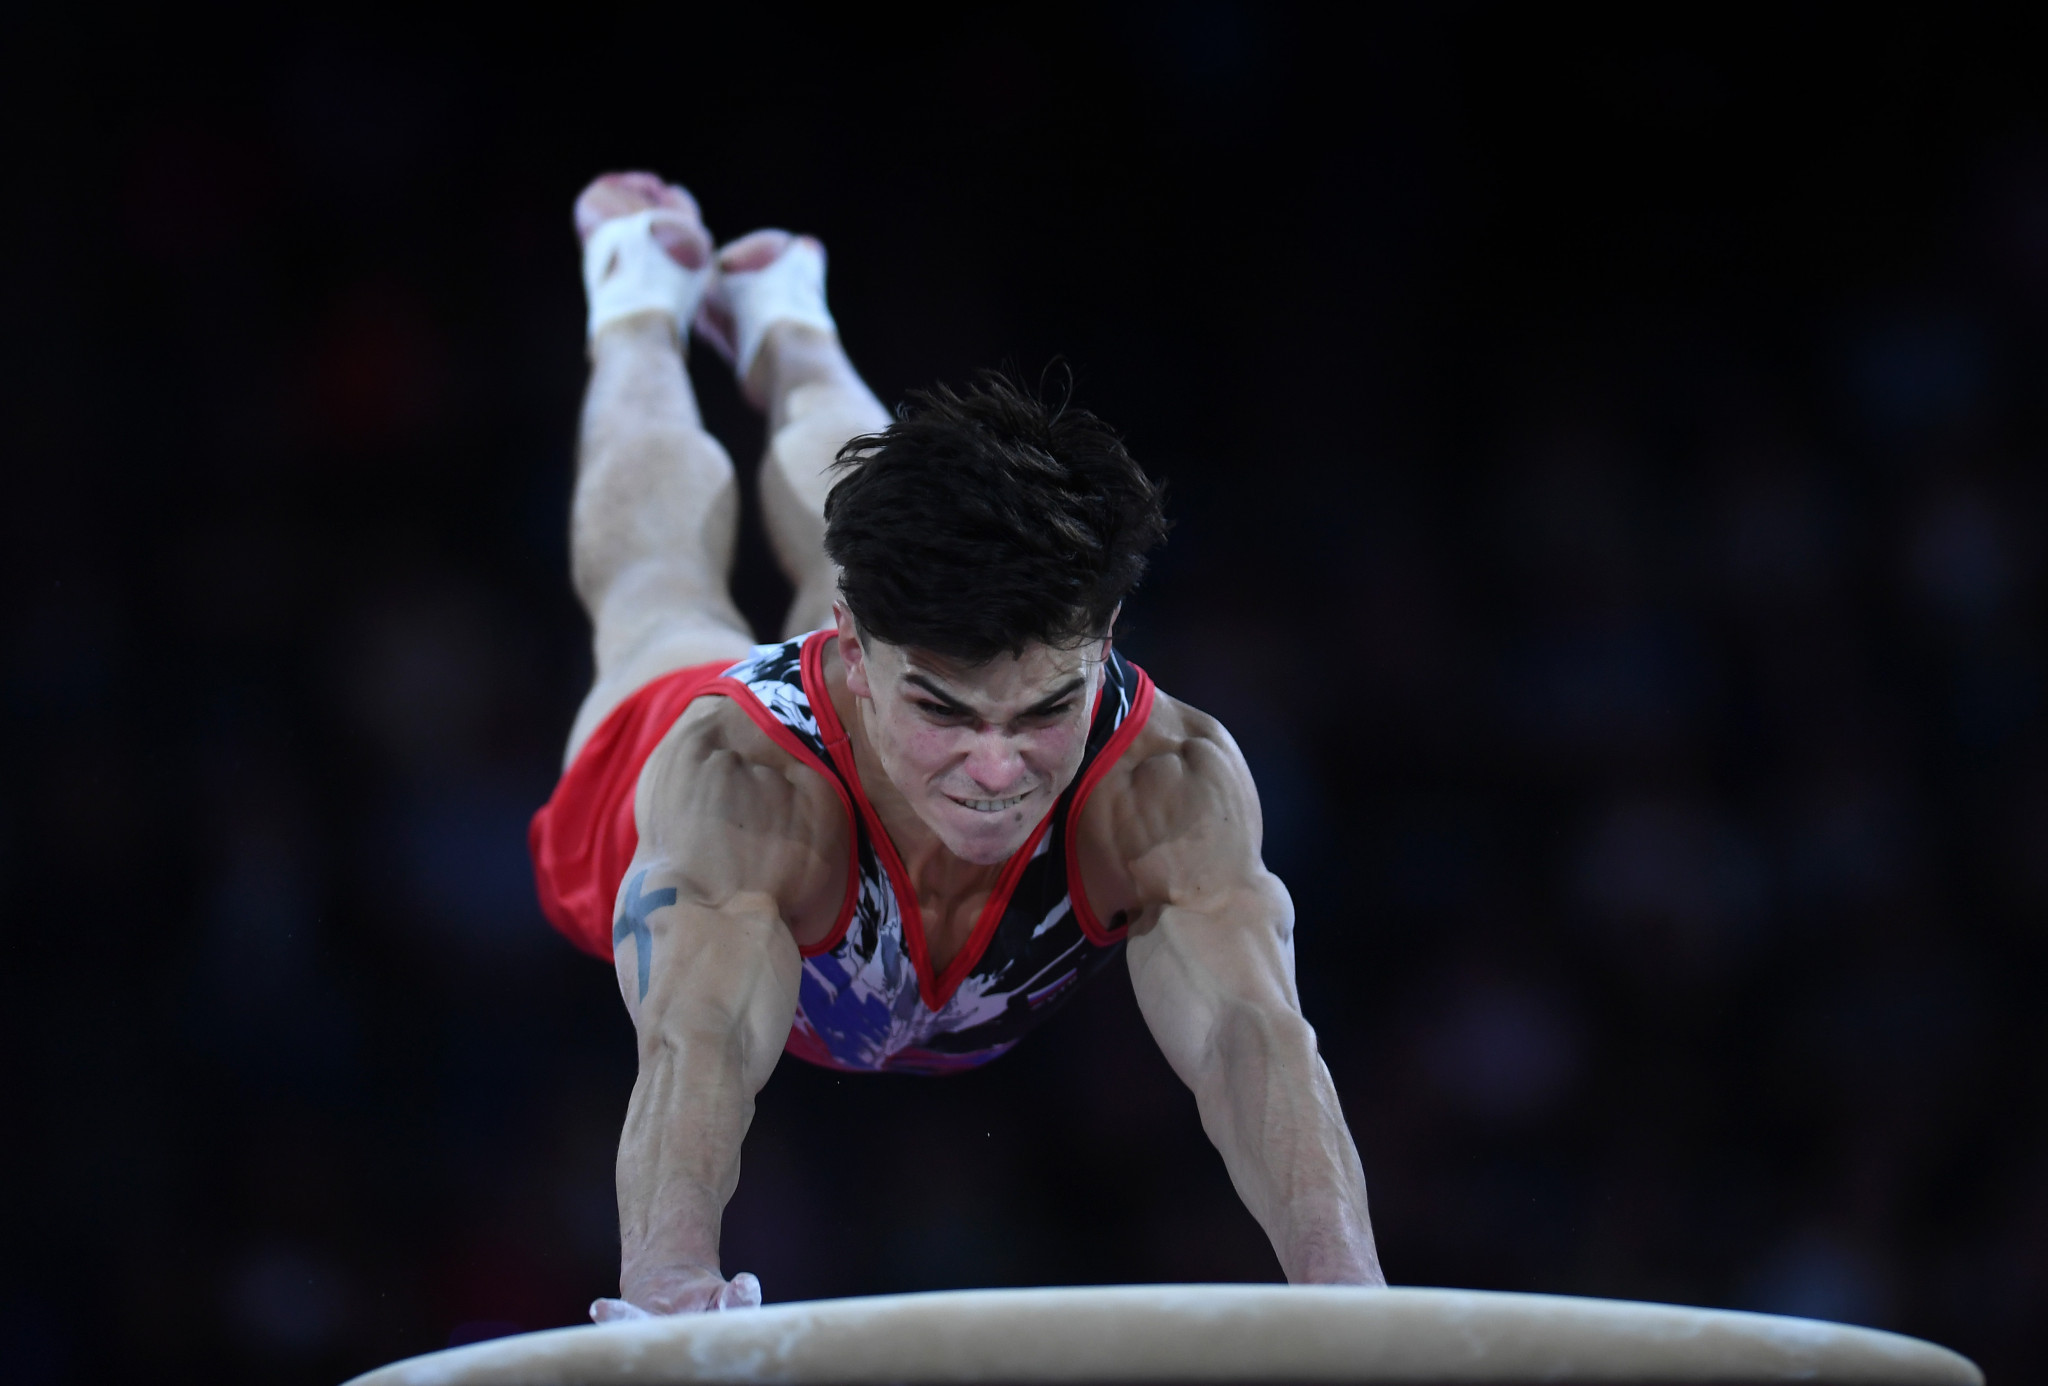 Russia's Dalaloyan aims to compete until Paris 2024